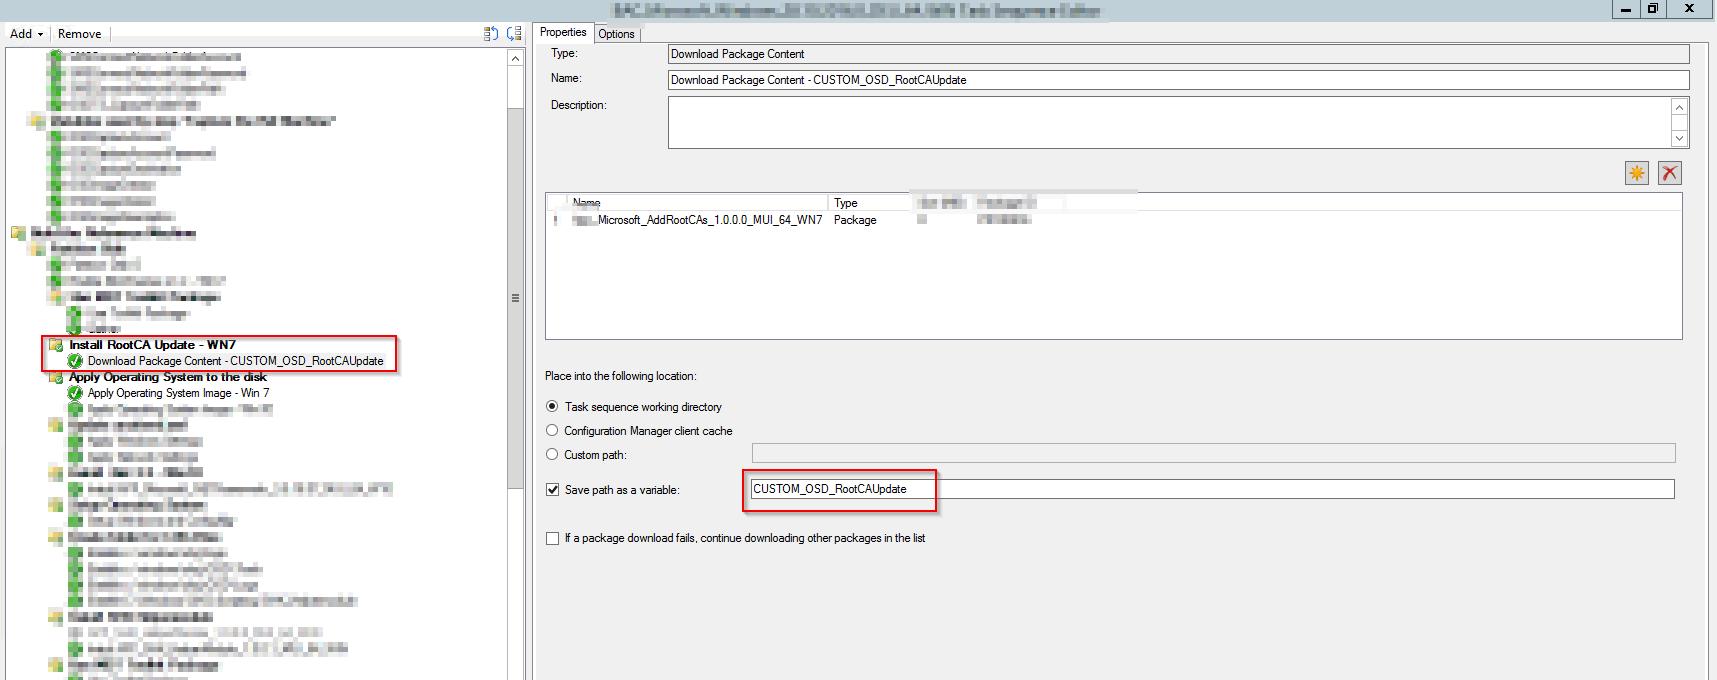 SCCM 1610 Build and Capture Windows 7 Config Manager Client